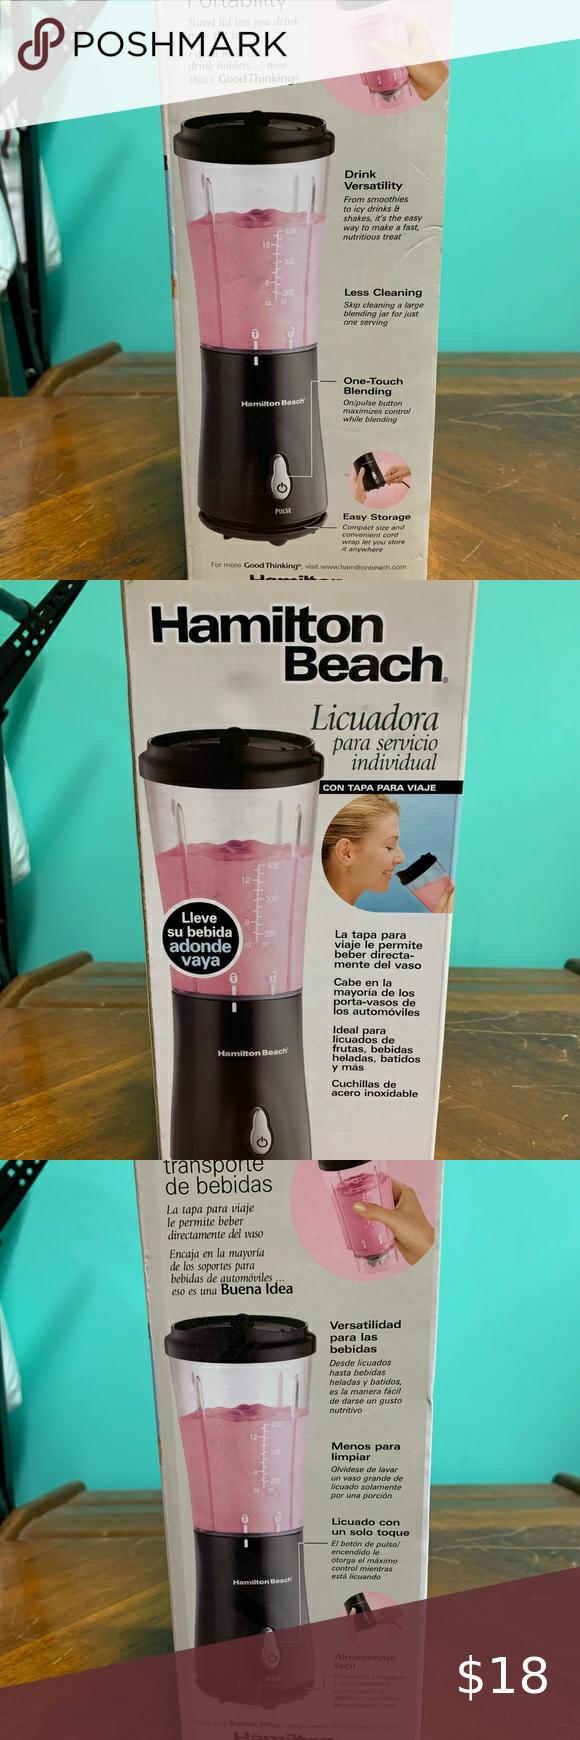 Brand New Hamilton Beach Blender Blender Hamilton Beach Hamilton